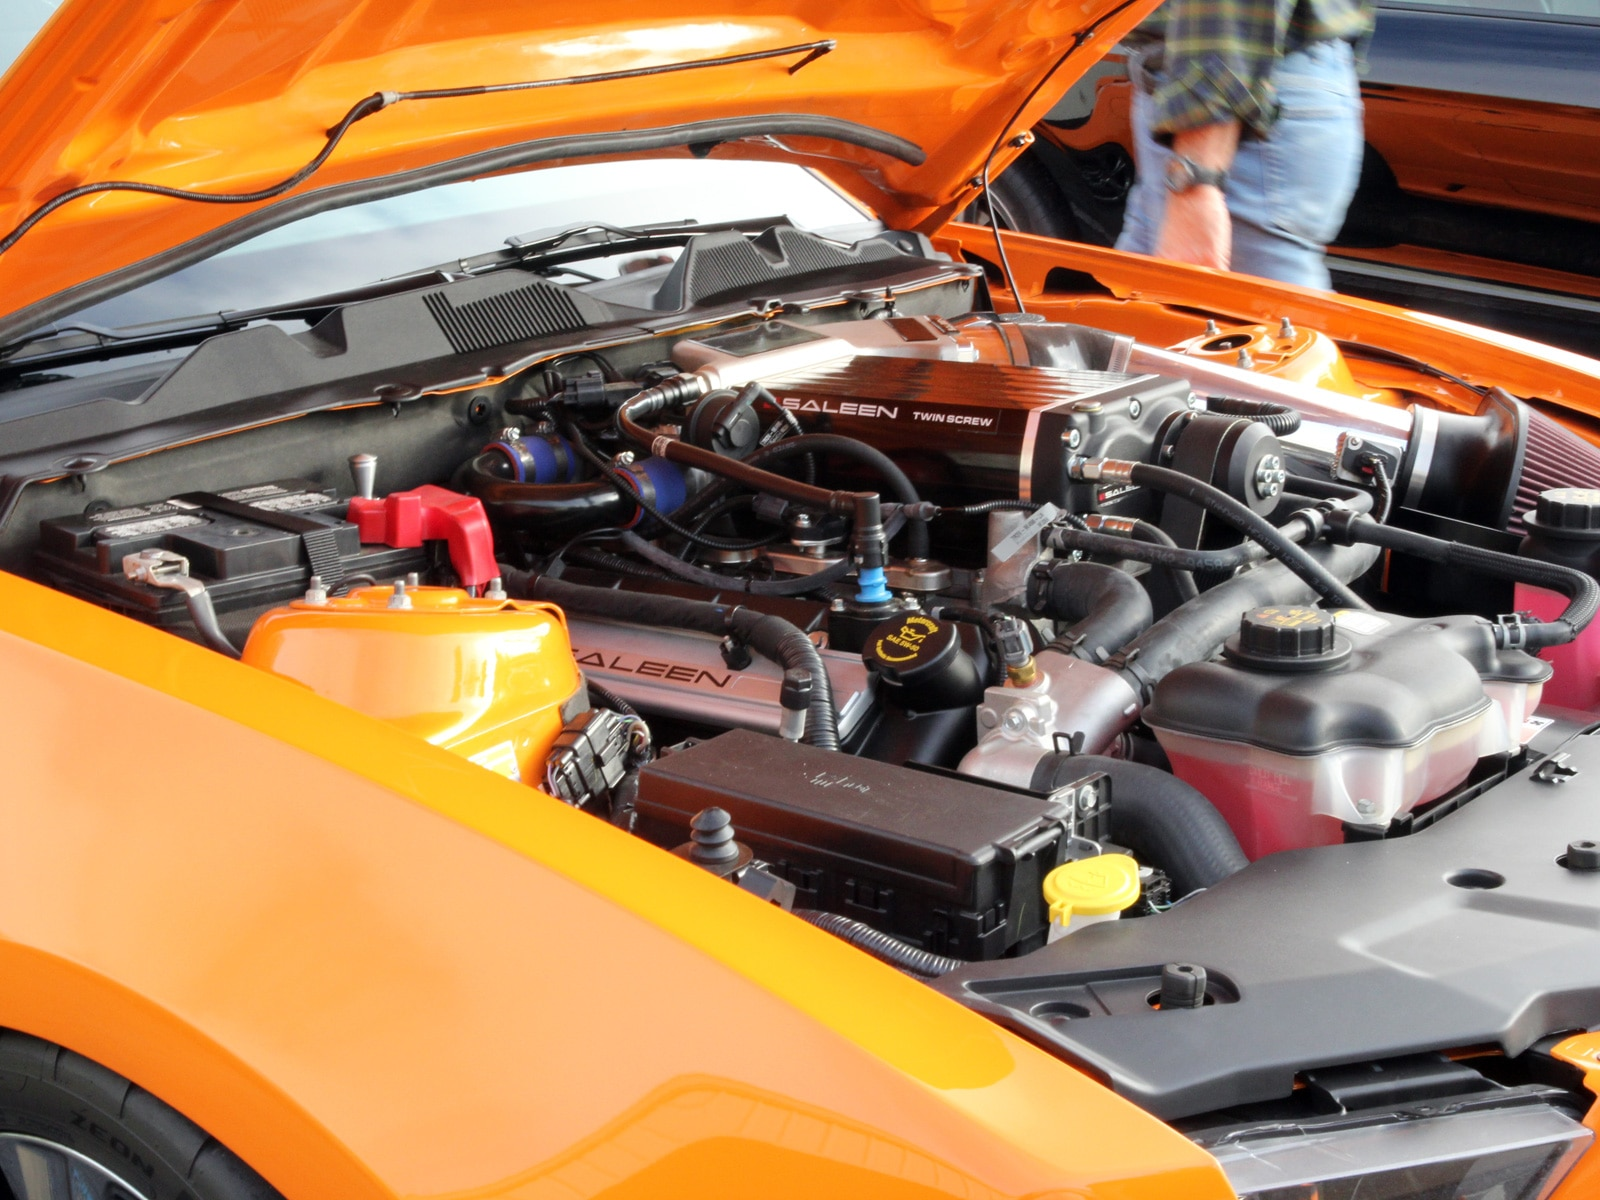 1401 2013 Saleen S351 Ford Mustang Orange Engine